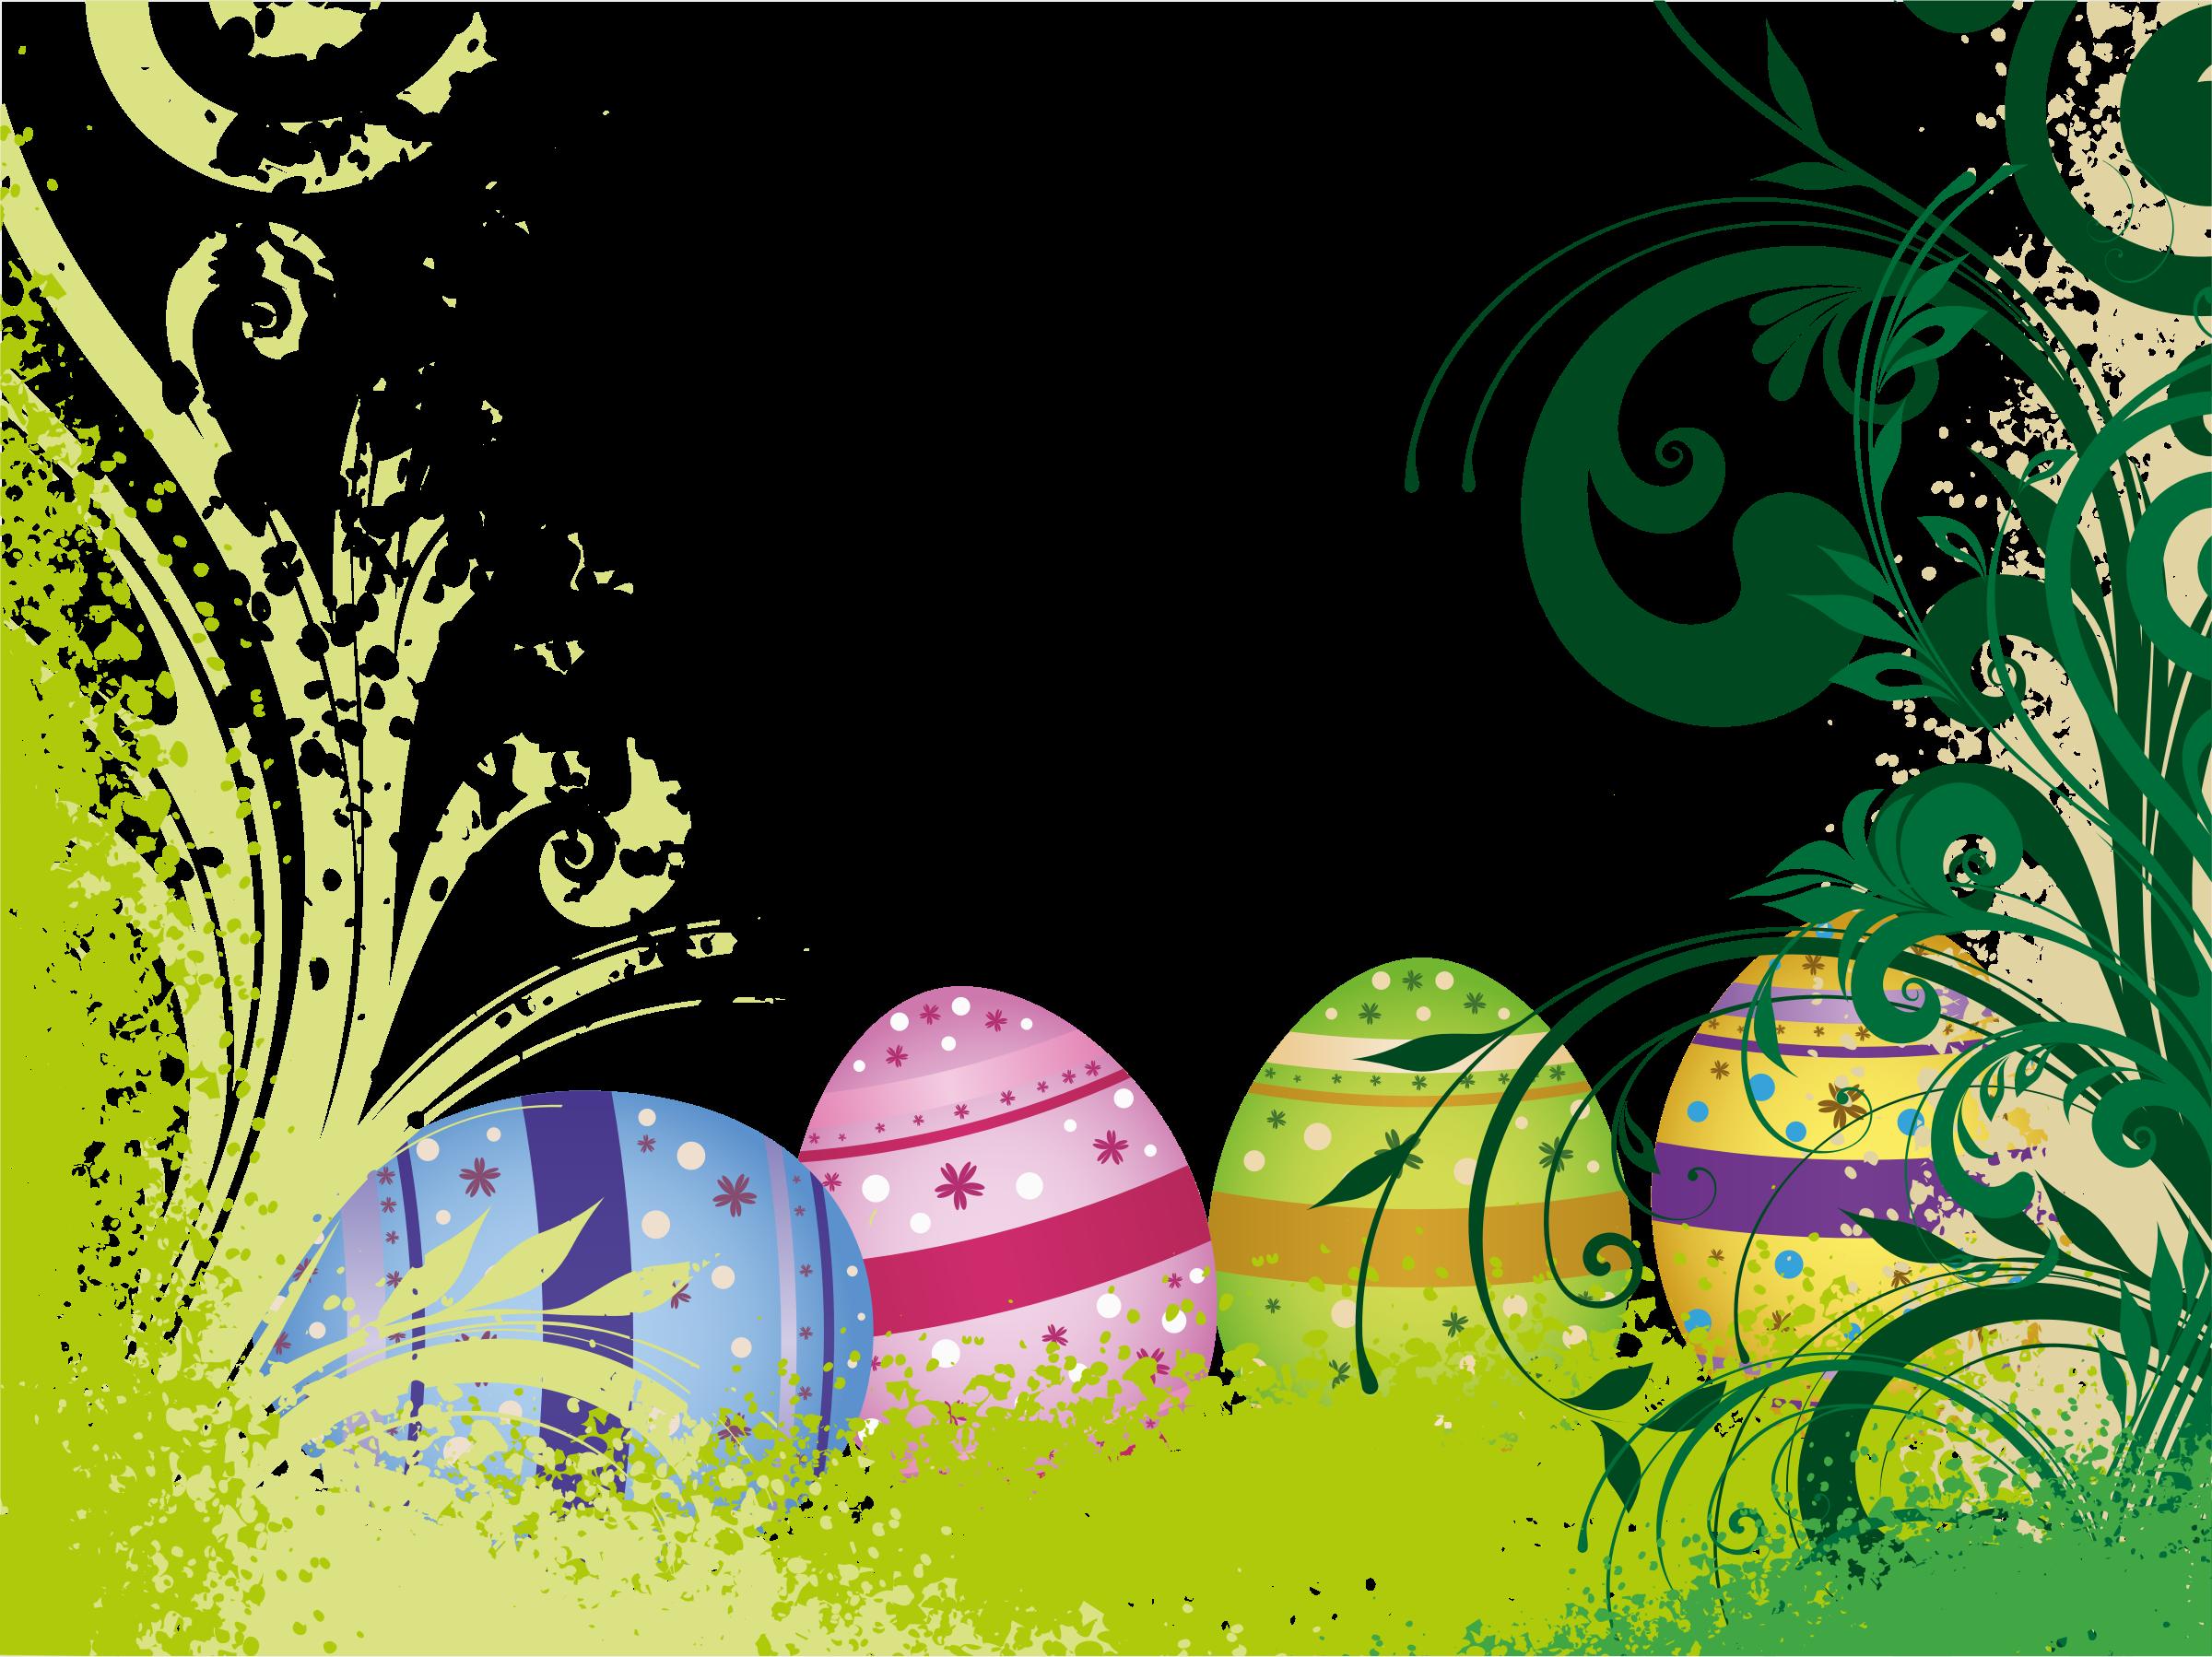 Flourish easter egg clipart svg free download Flourish easter egg clipart - ClipartFox svg free download